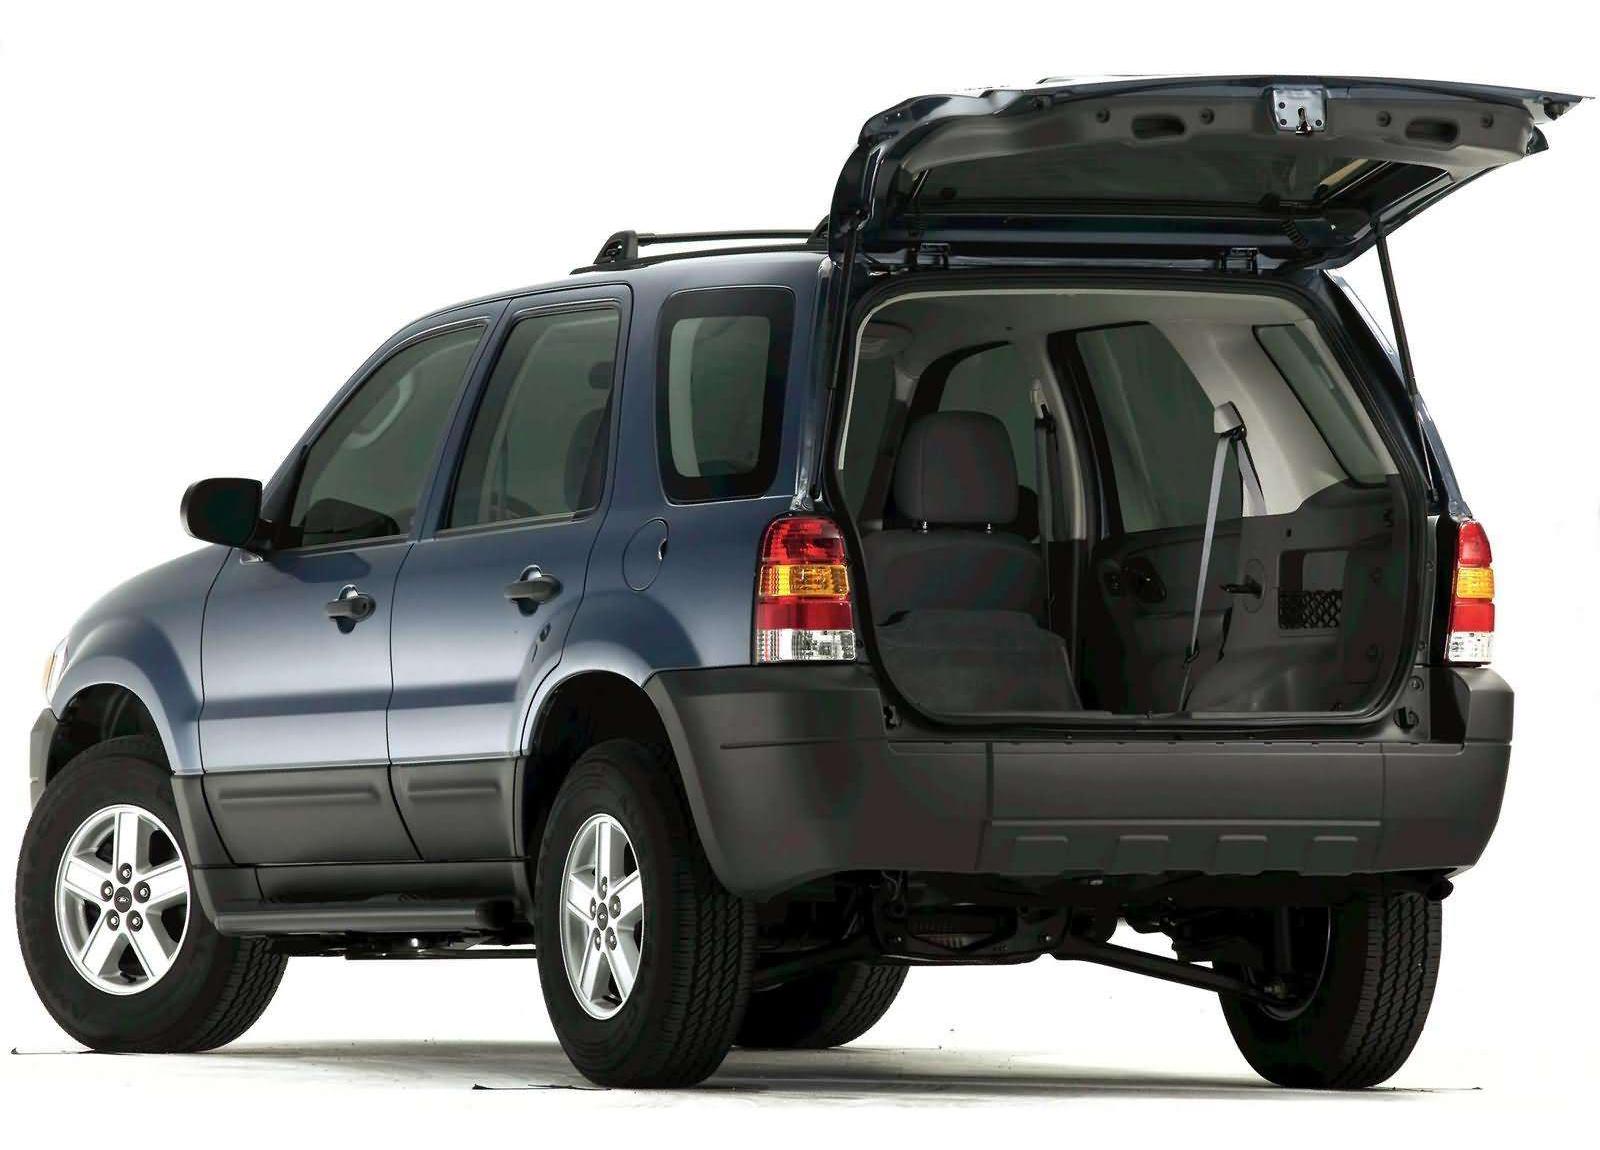 2005 Ford Escape Hd Pictures Carsinvasion Com